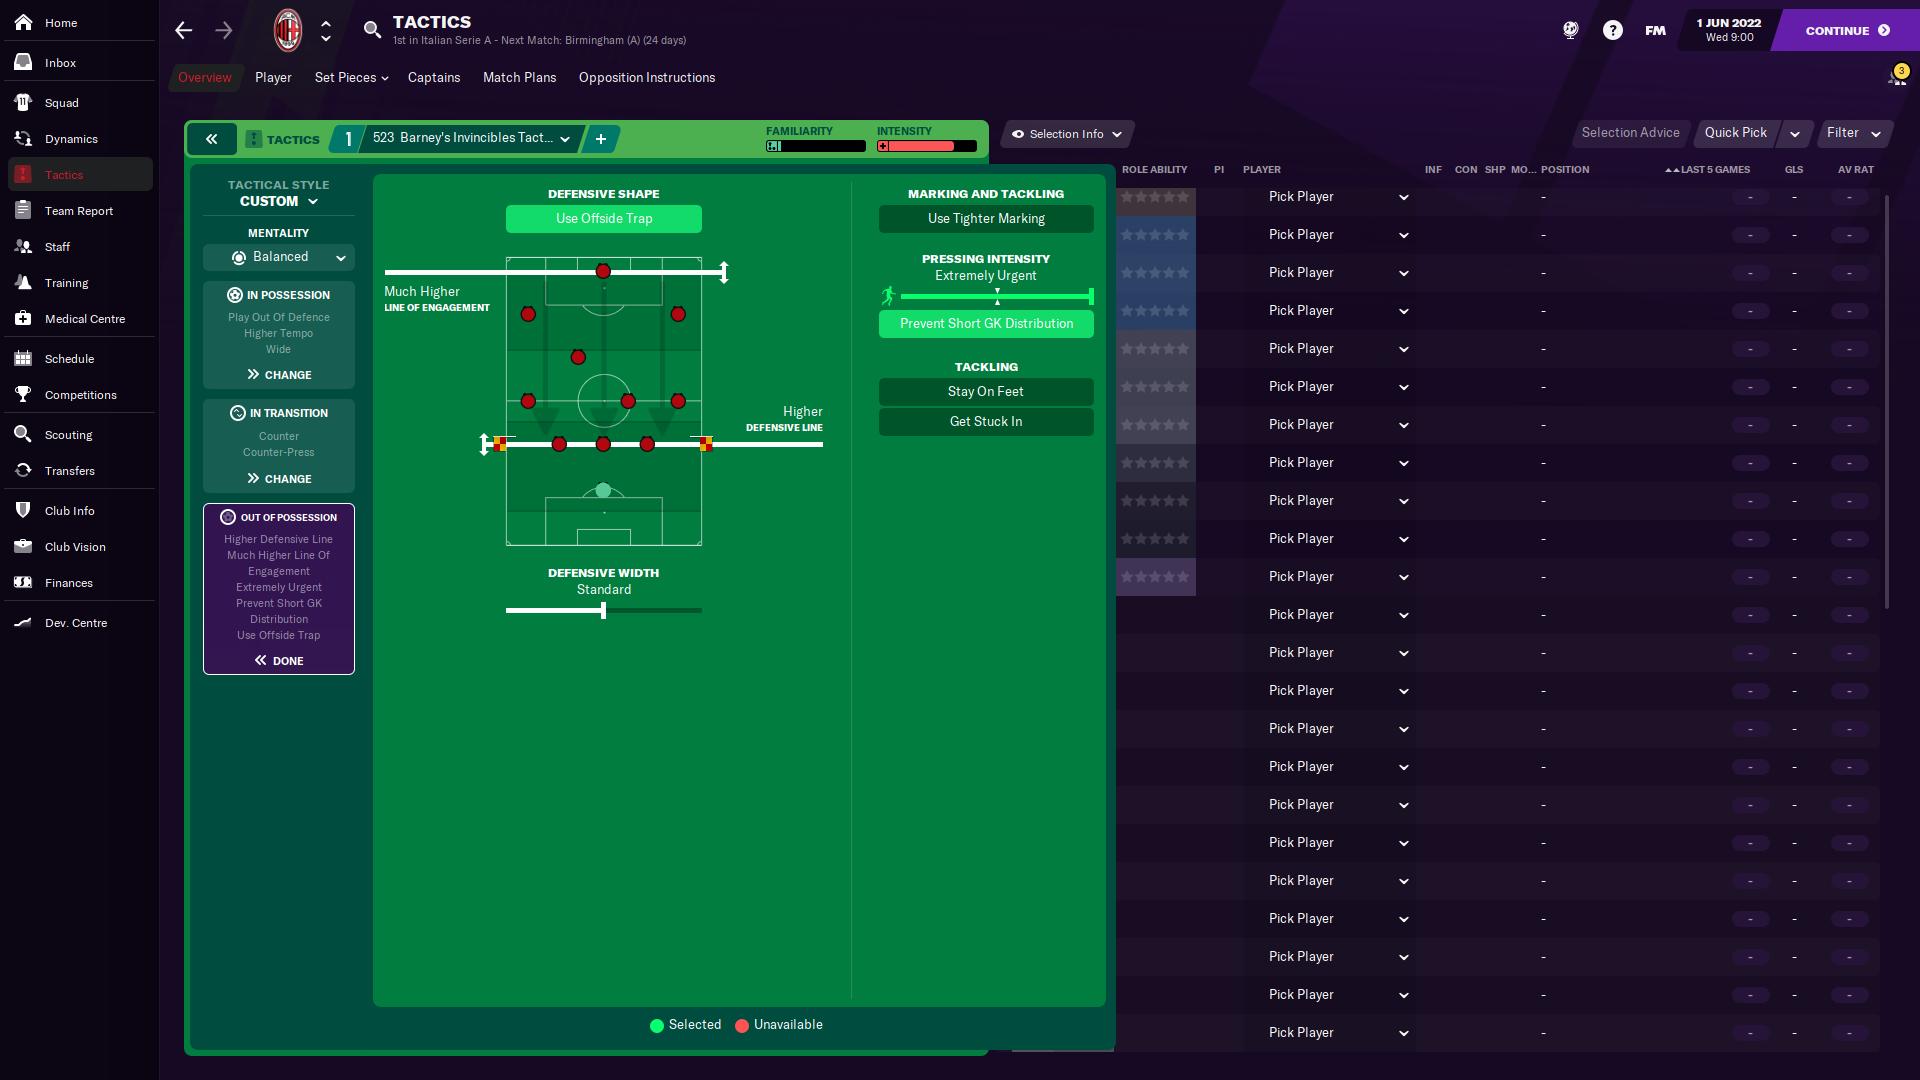 Football Manager Screenshot 2020.12.15 - 14.24.02.04.png